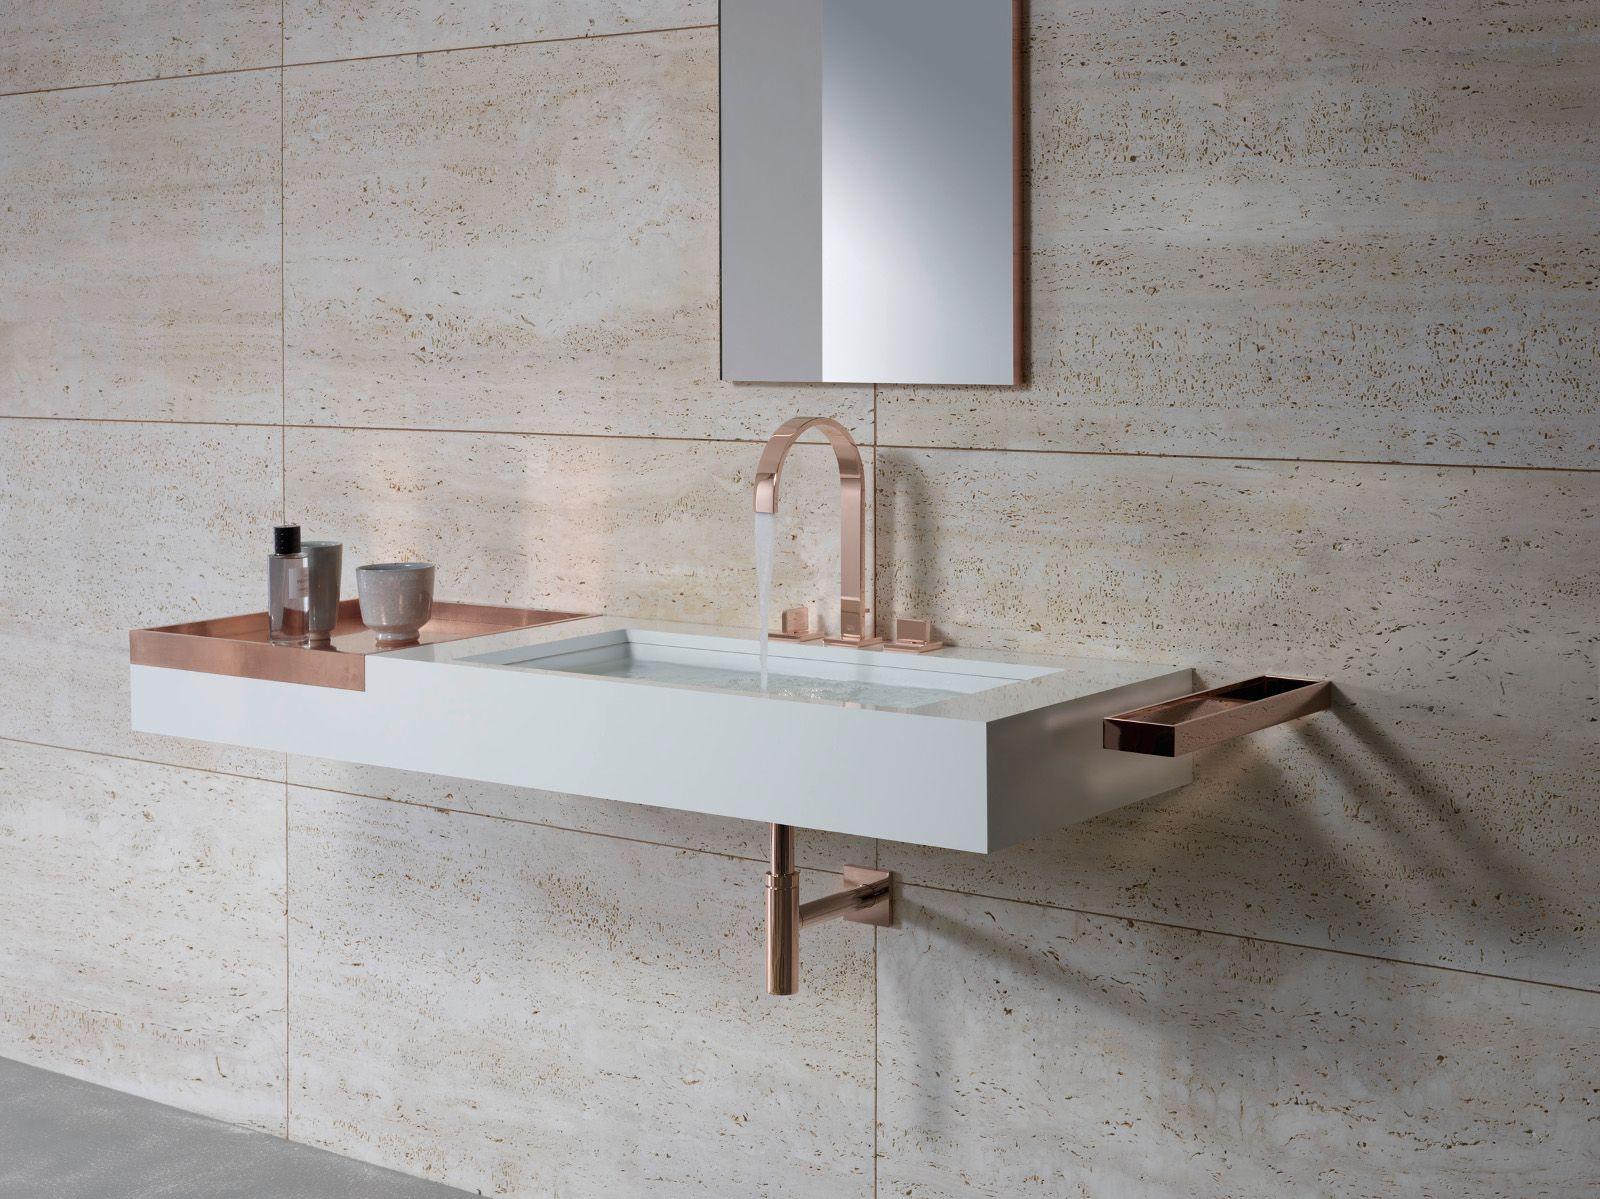 Mem Bath Spa Fitting Dornbracht With Images Gold Bathroom Bathroom Trends Modern Bathroom Trends